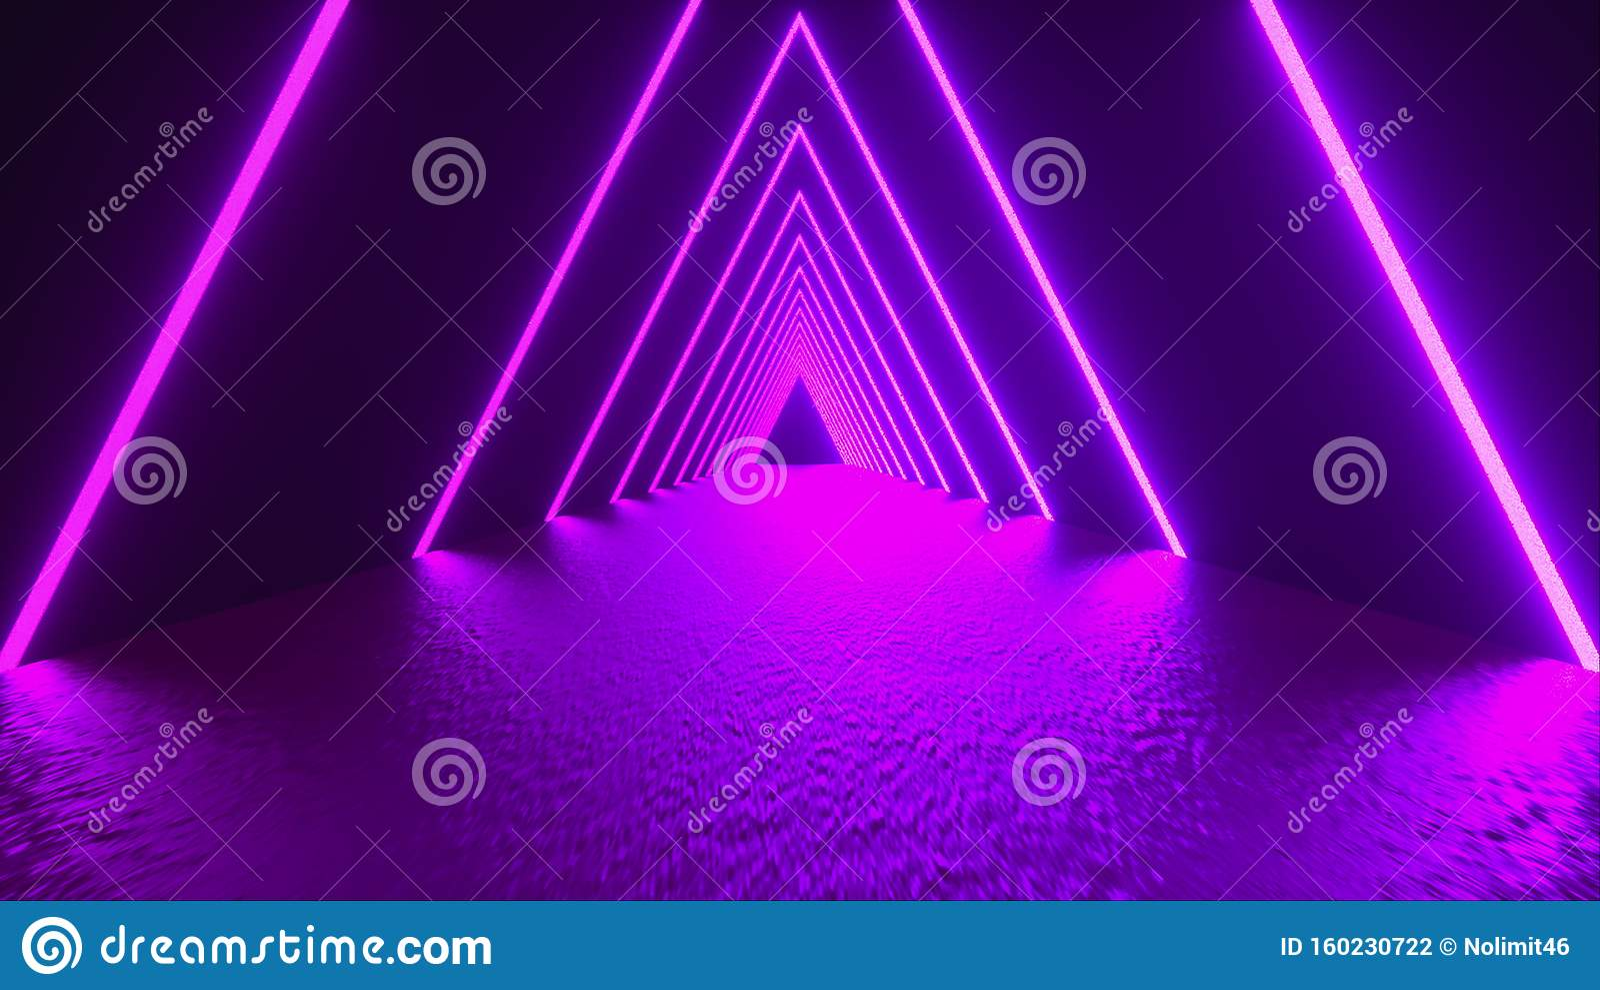 3D-rendering, abstracte achtergrond, virtuele realiteit, computer gegenereerde fluorescerende ultraviolet licht, gloeiende neonli